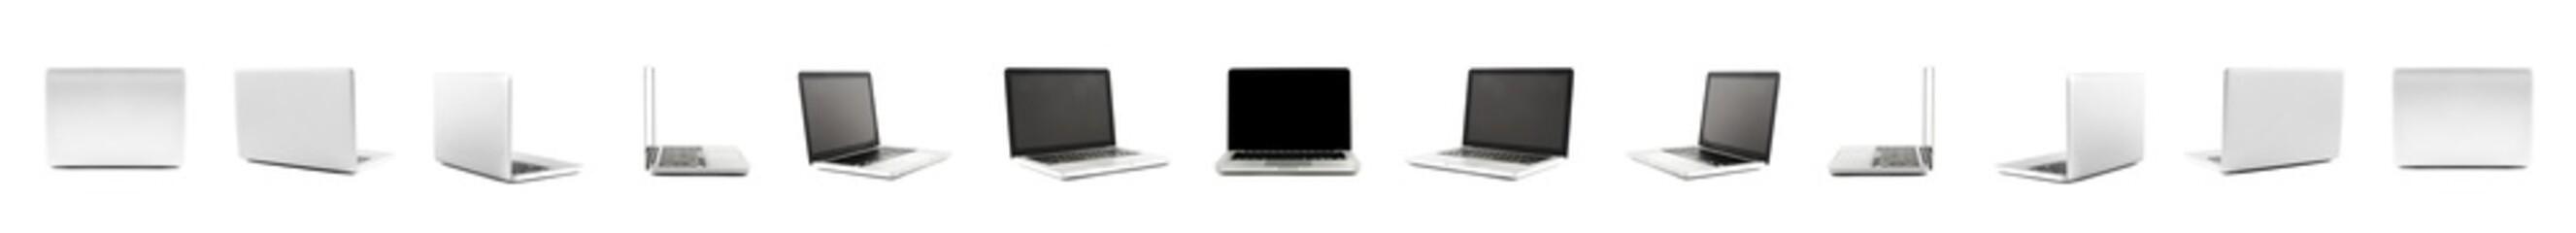 Fototapeta Collection of High definition views of a design laptop obraz